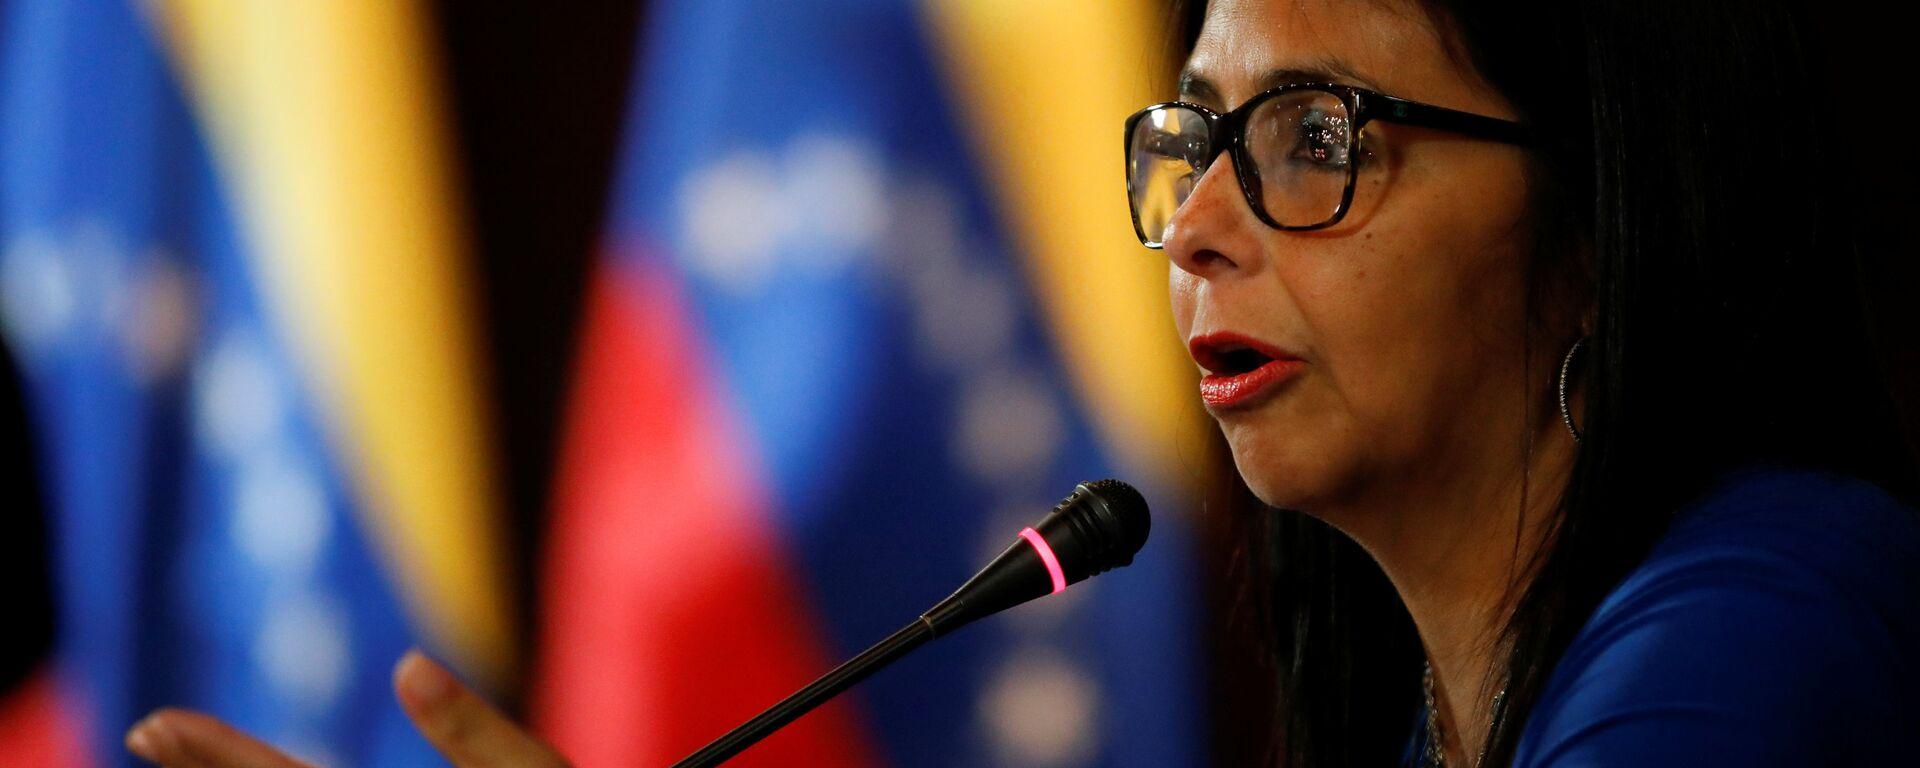 Delcy Rodríguez, vicepresidenta de Venezuela - Sputnik Mundo, 1920, 22.09.2021